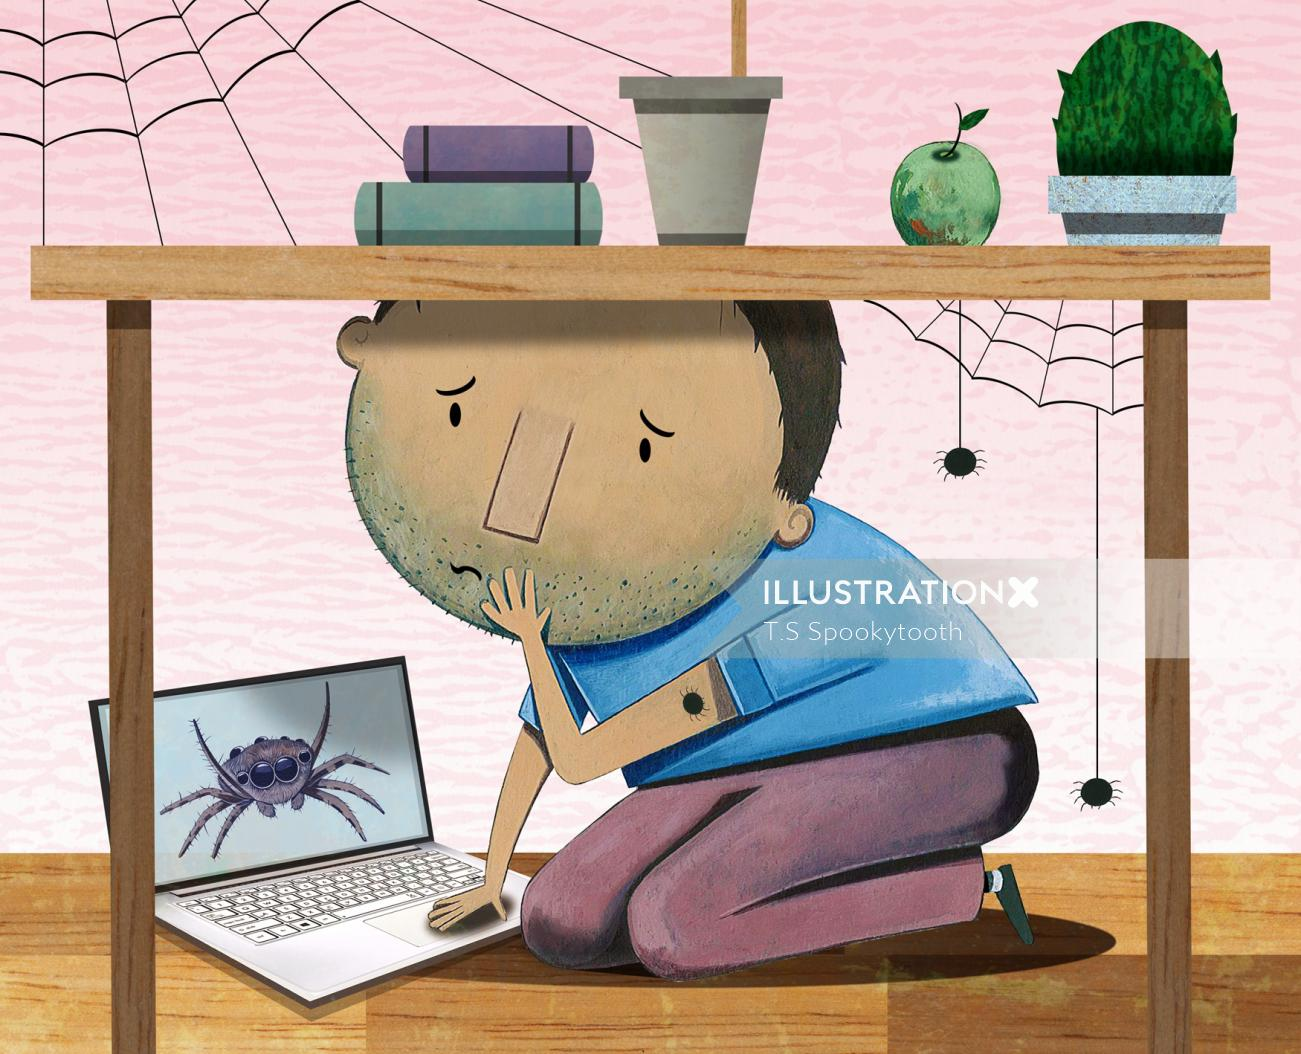 Children boy under table with webs